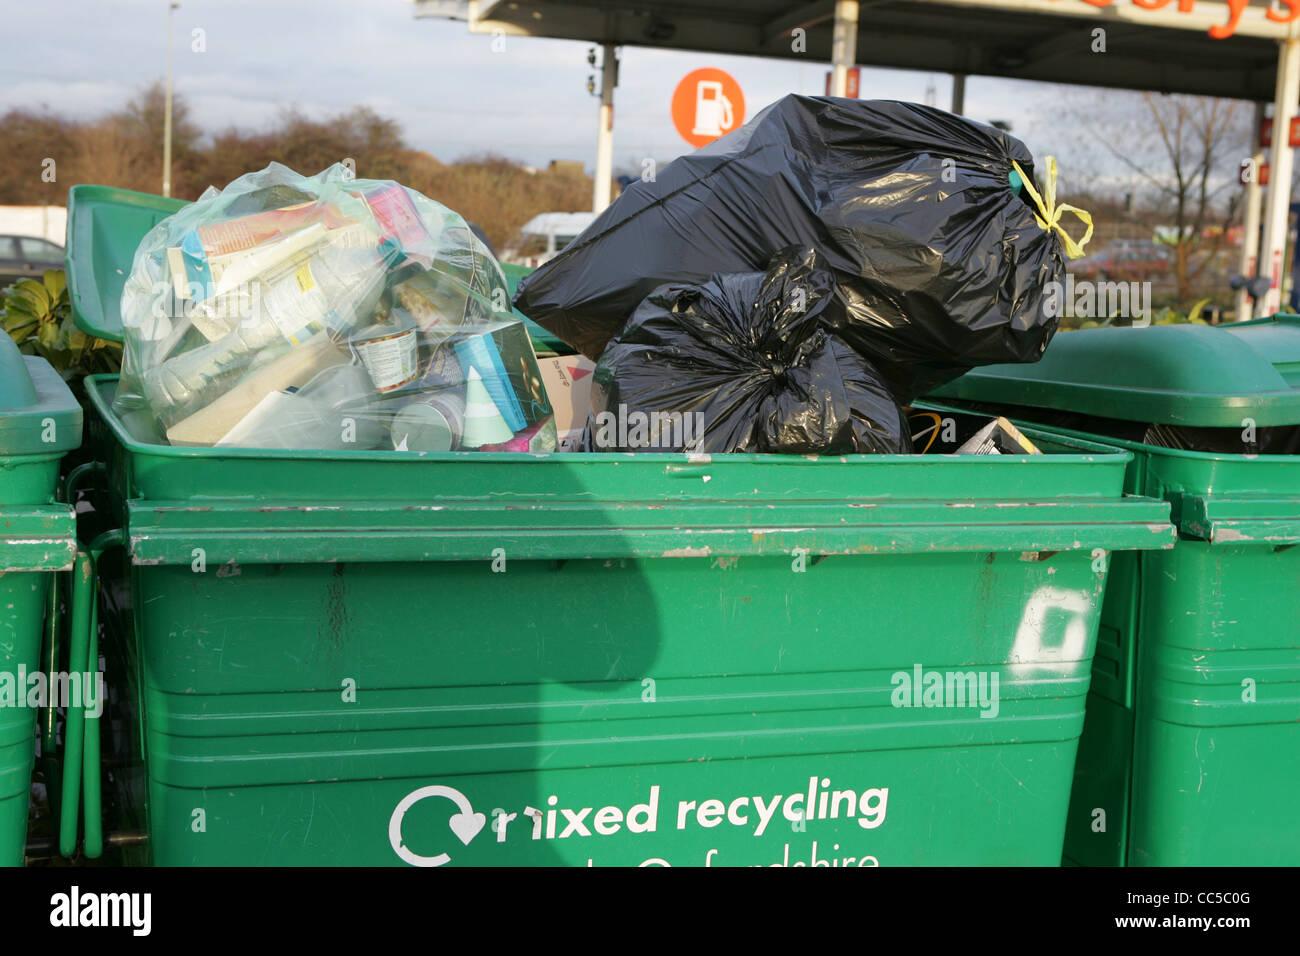 mixed recycling centre at sainsburys didcot jan 2012 - Stock Image